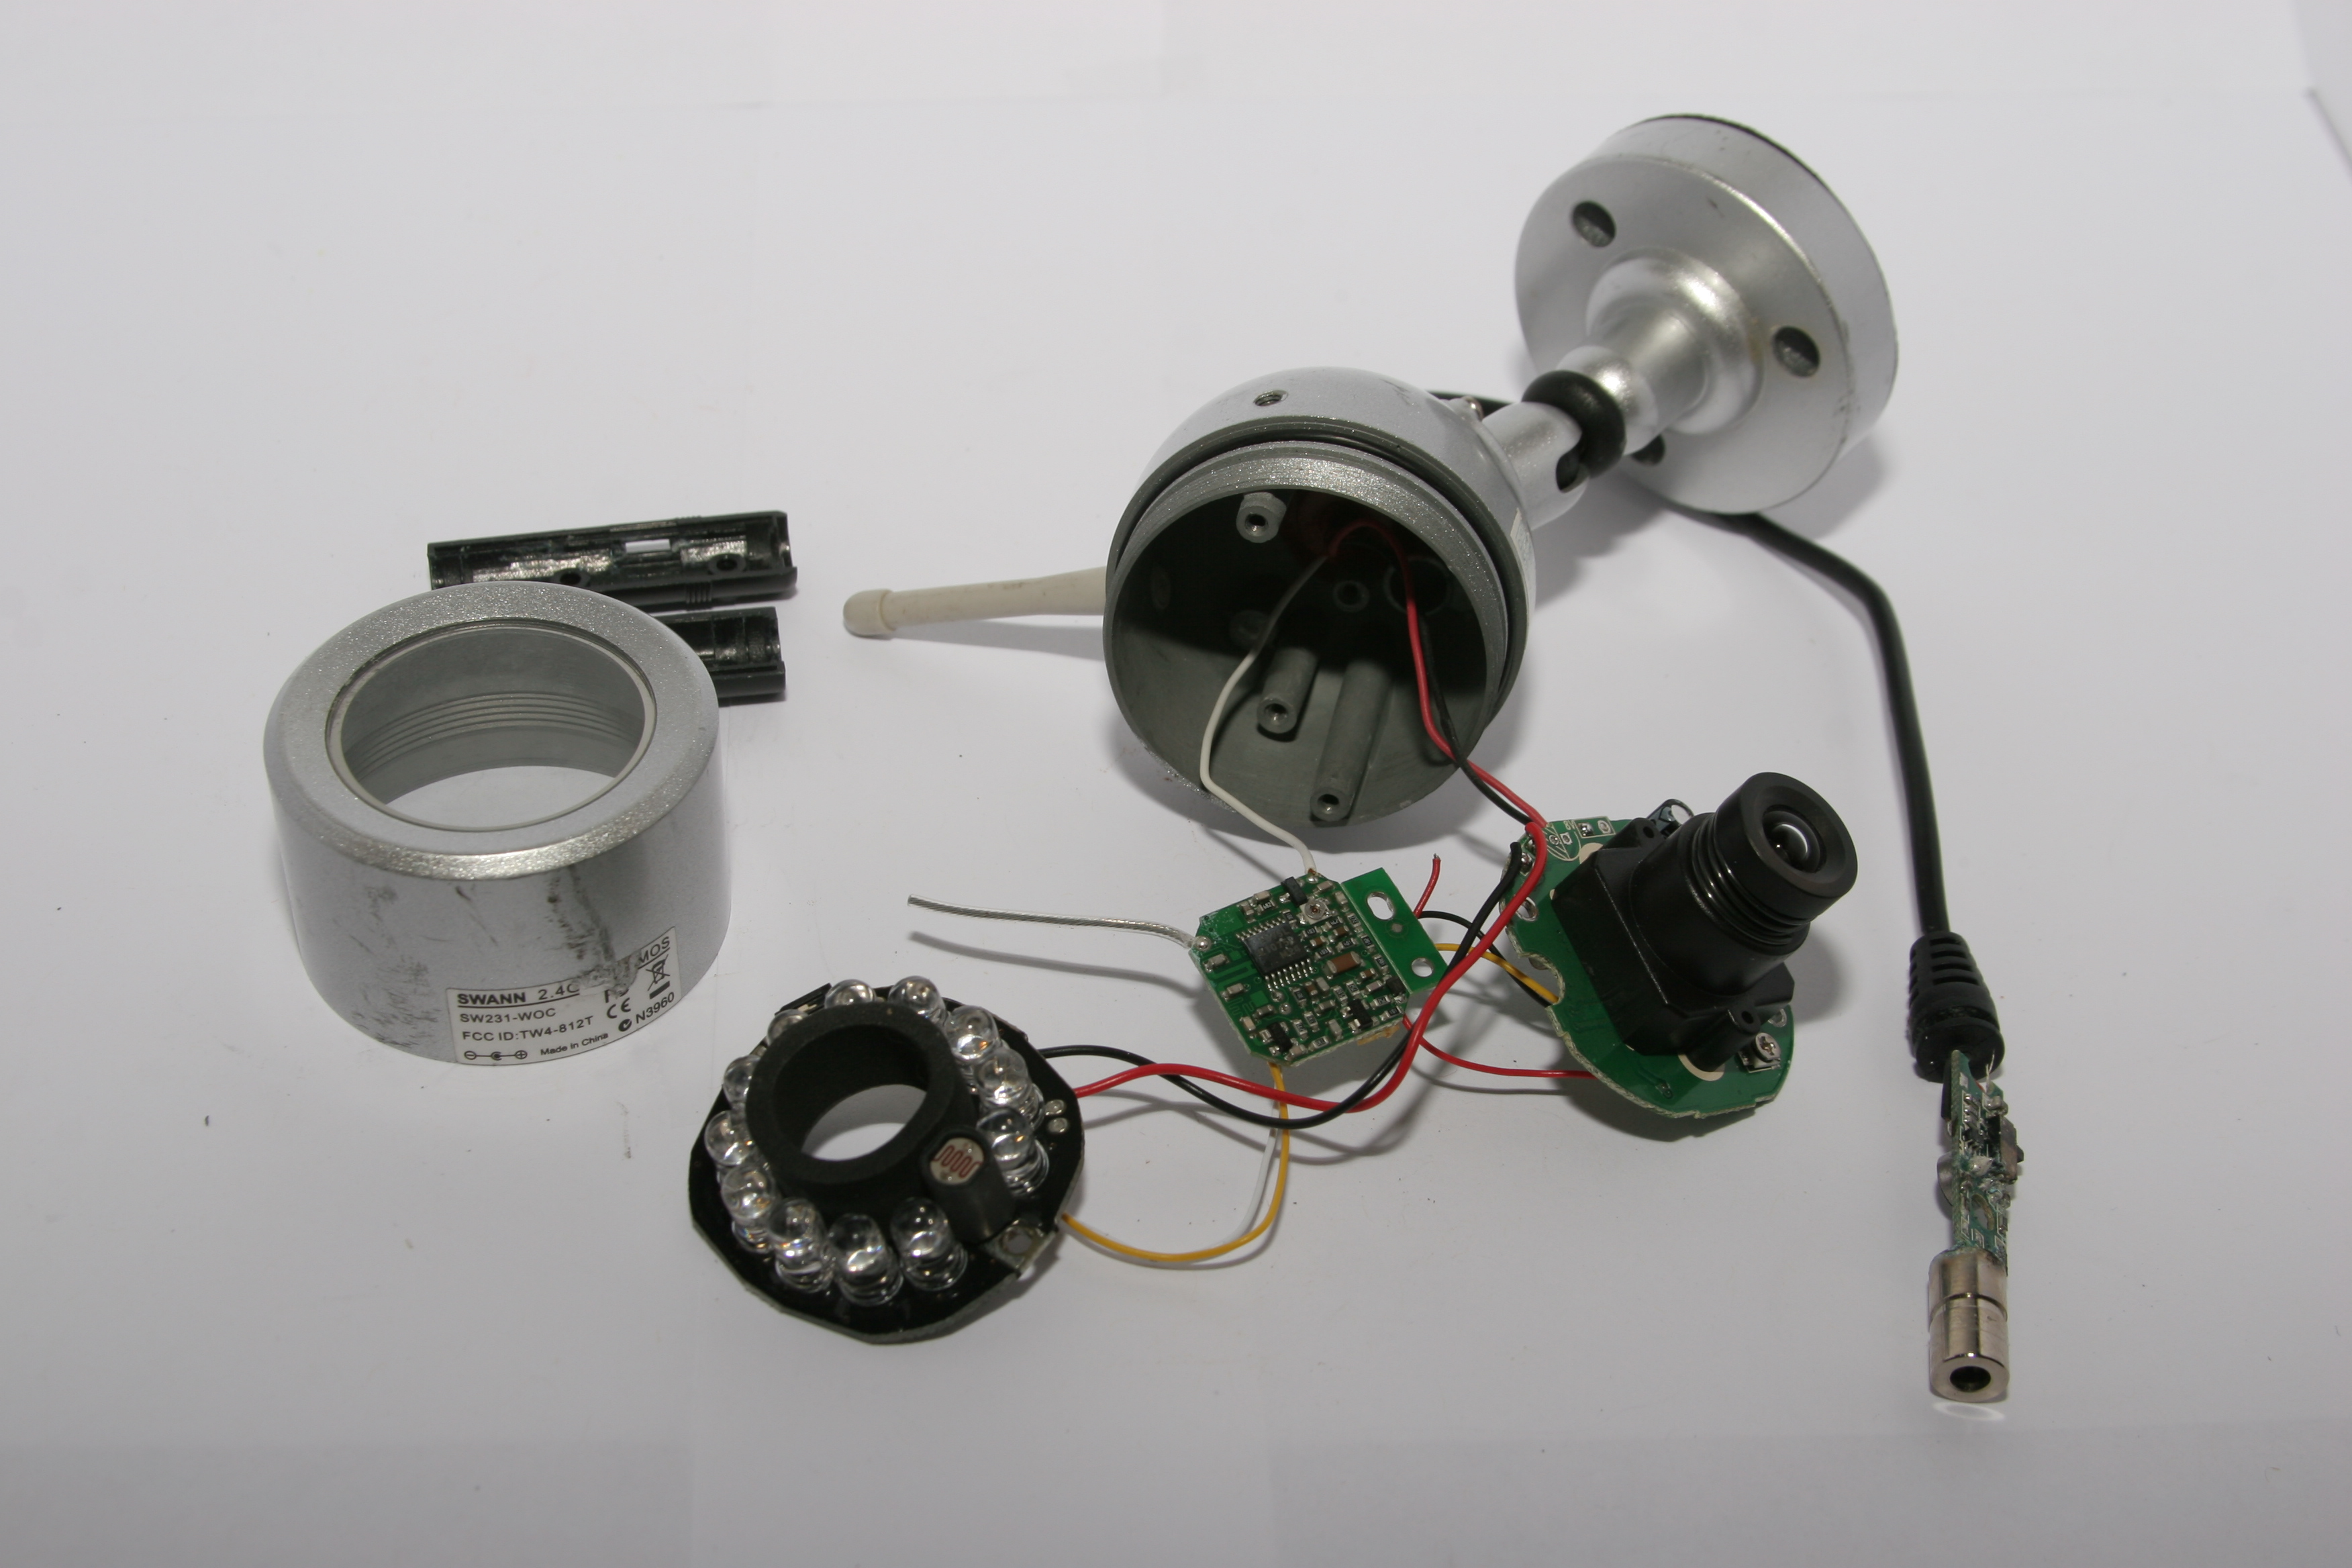 Wiring Diagram Swann Security Camera